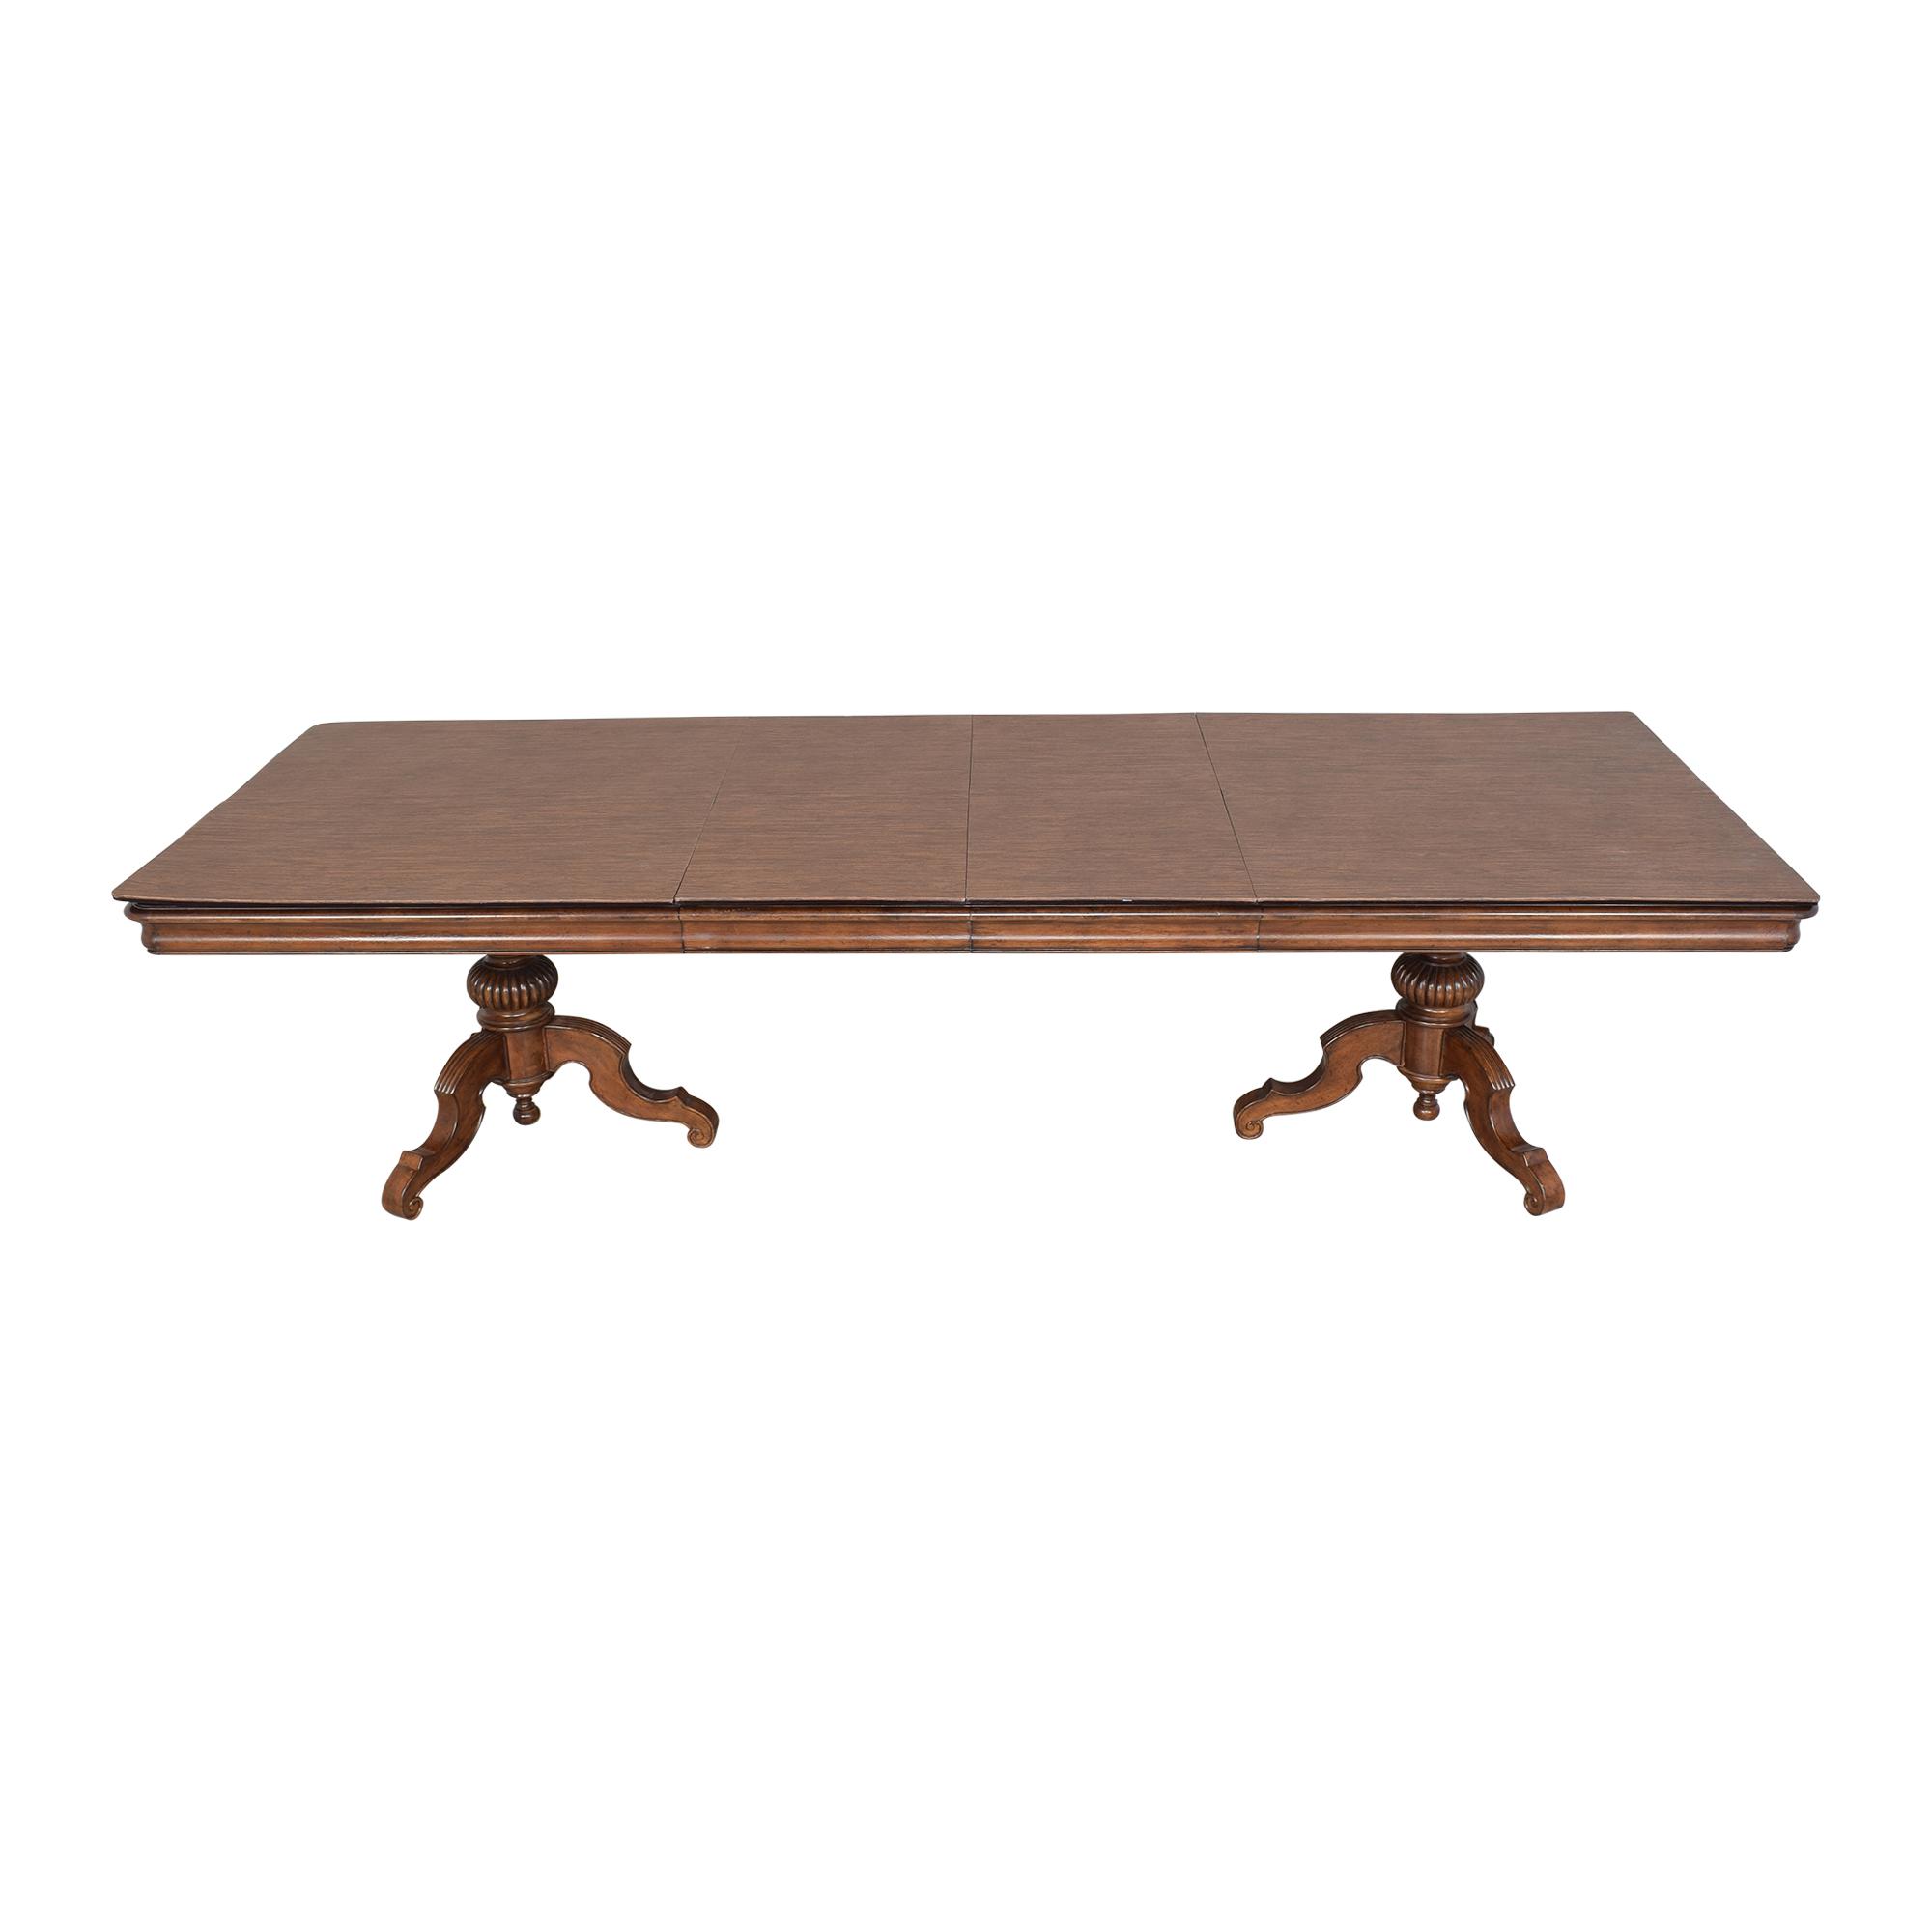 Thomasville Thomasville Ernest Hemingway Castillian Double Pedestal Dining Table ma